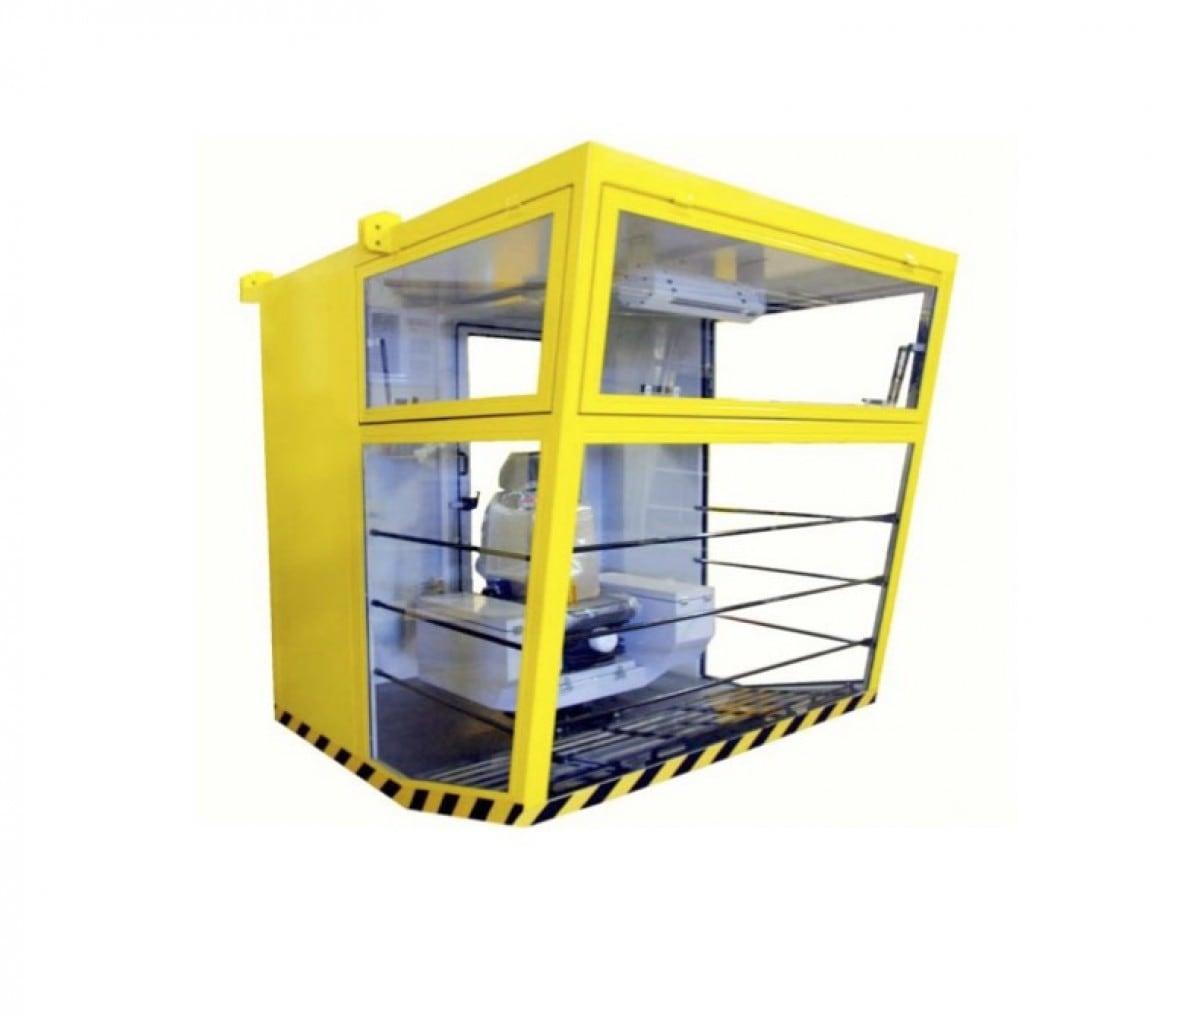 Petrokab cabine, model L: 2,25 × 1,9 × 2,3 m